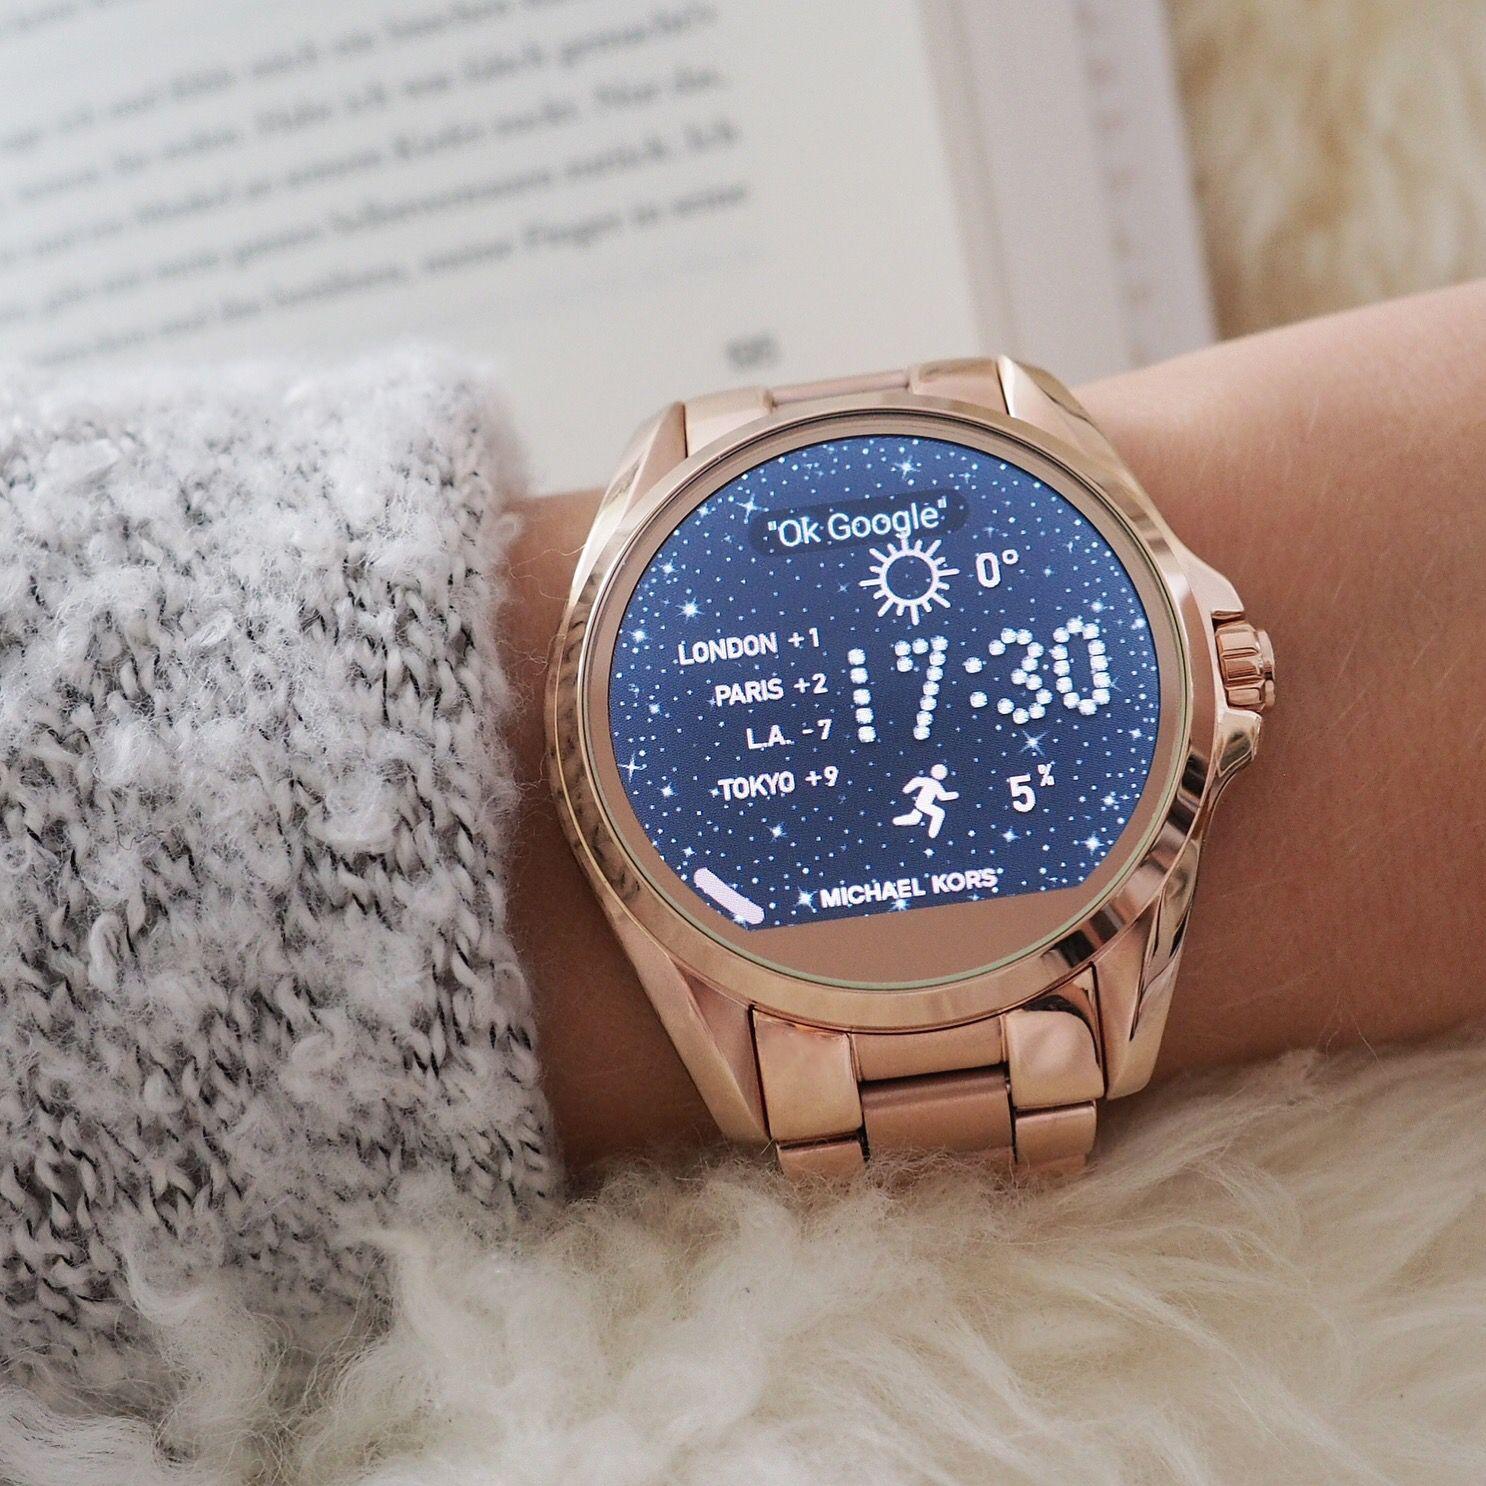 Michael Kors Access Smartwatch Reloj Relojes Michaelkors Venezuela Armbanduhr Frauen Handtaschen Michael Kors Michael Kors Uhr